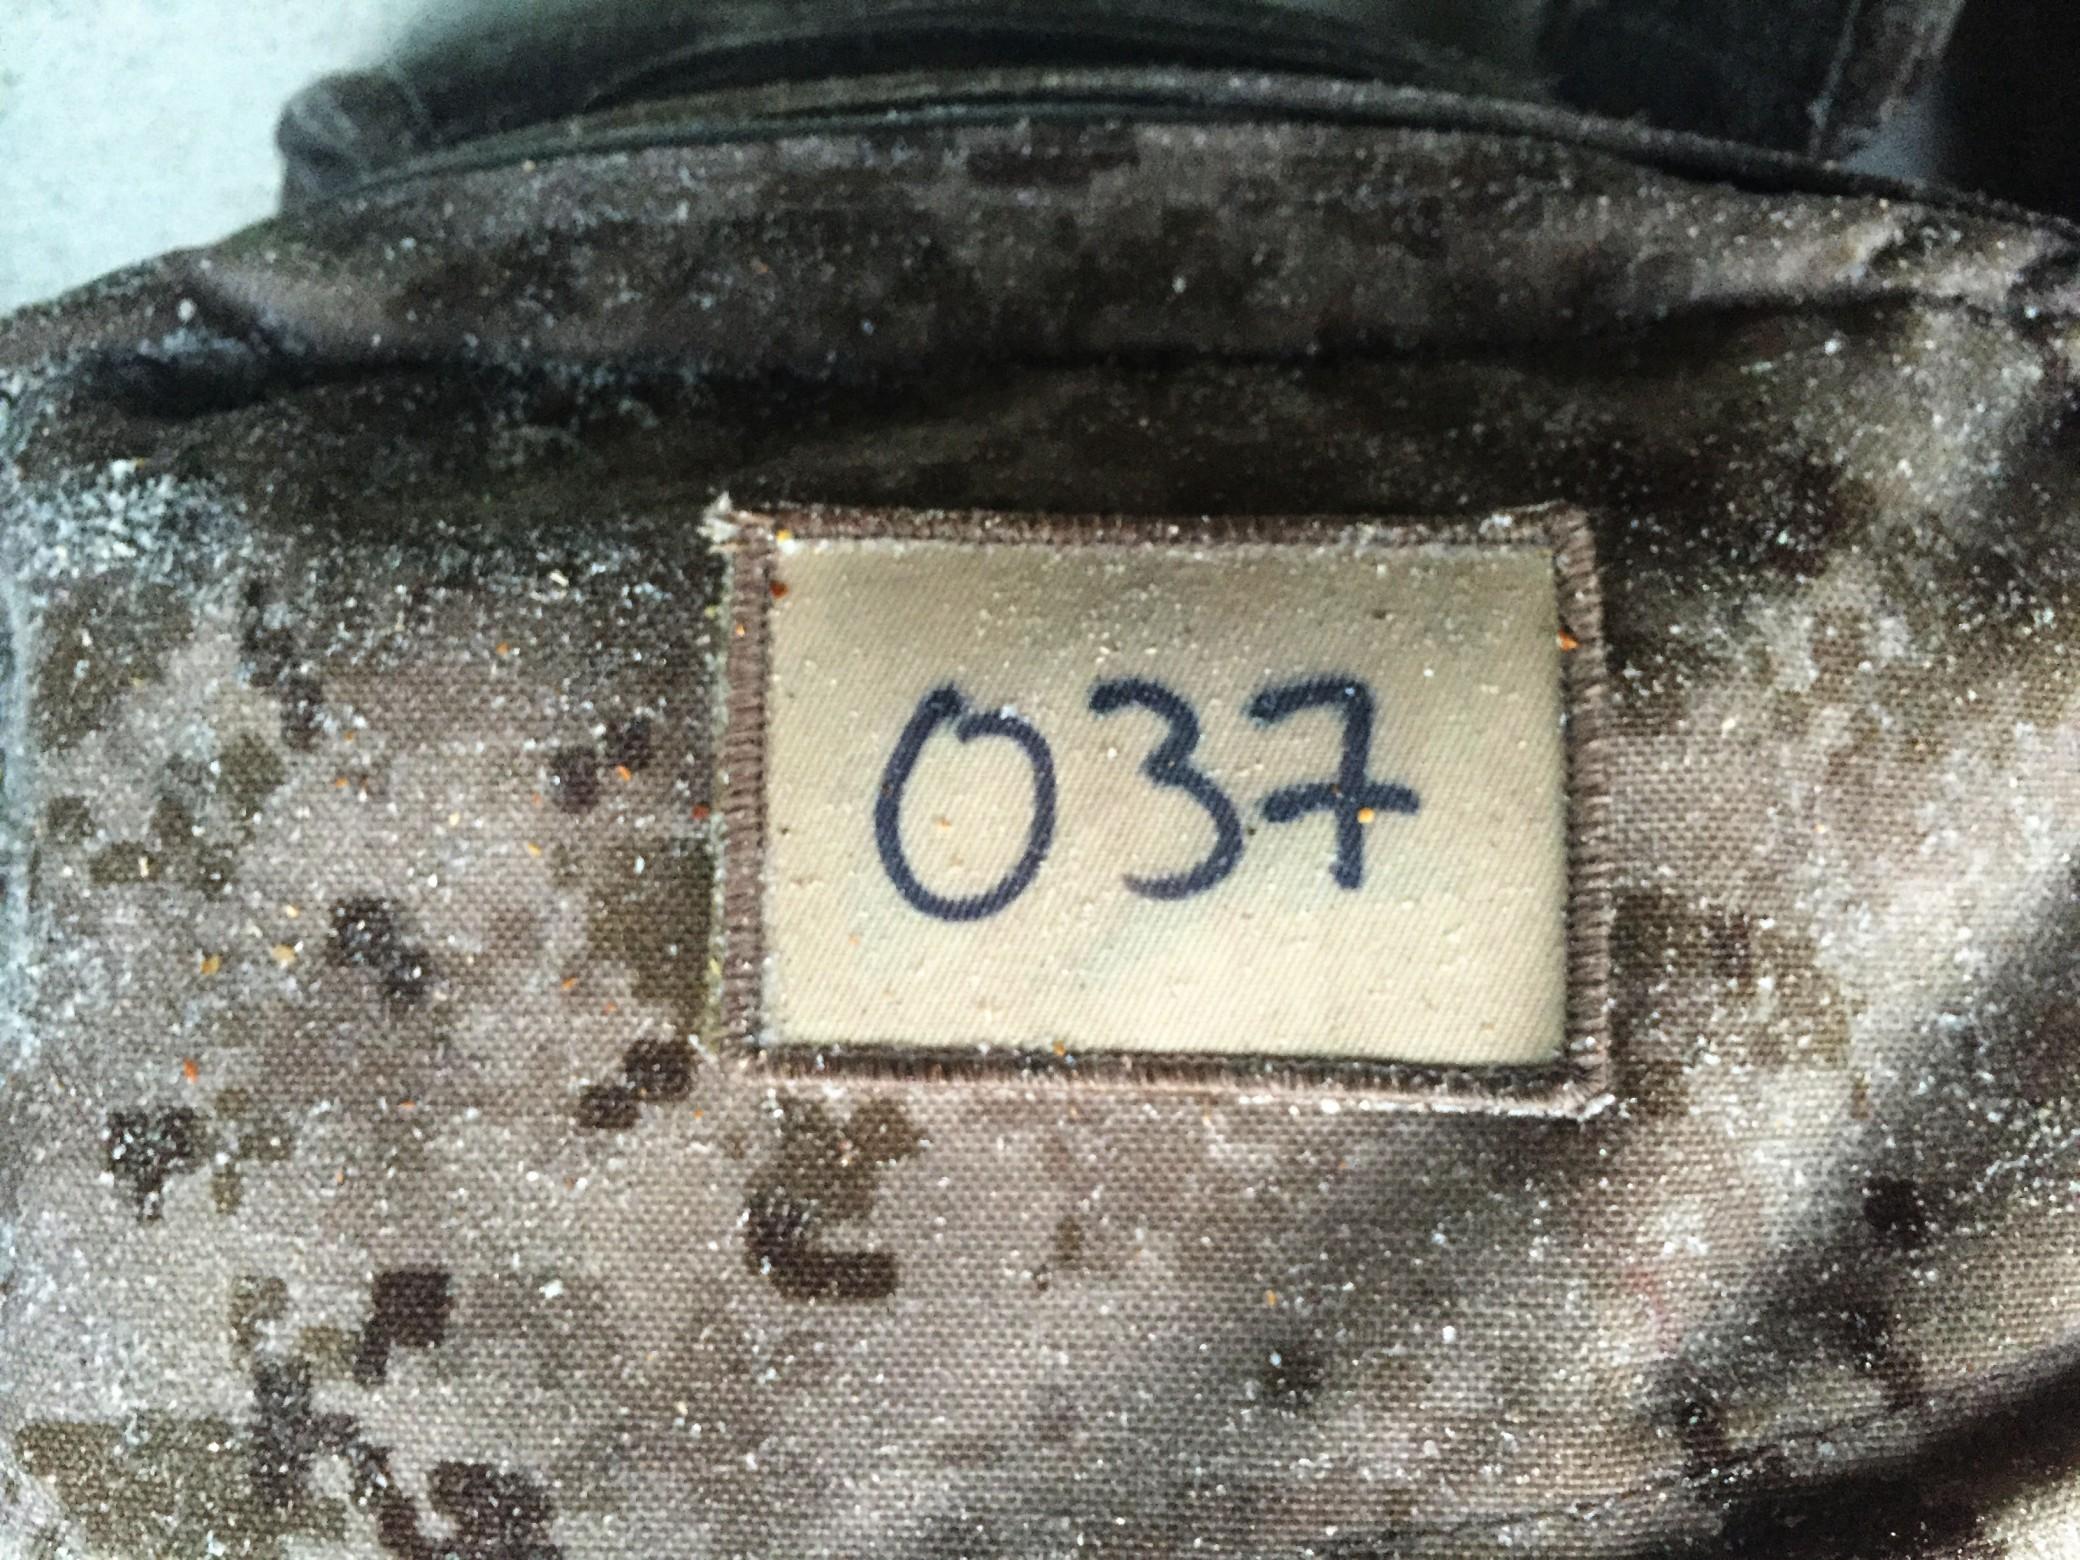 037_patch